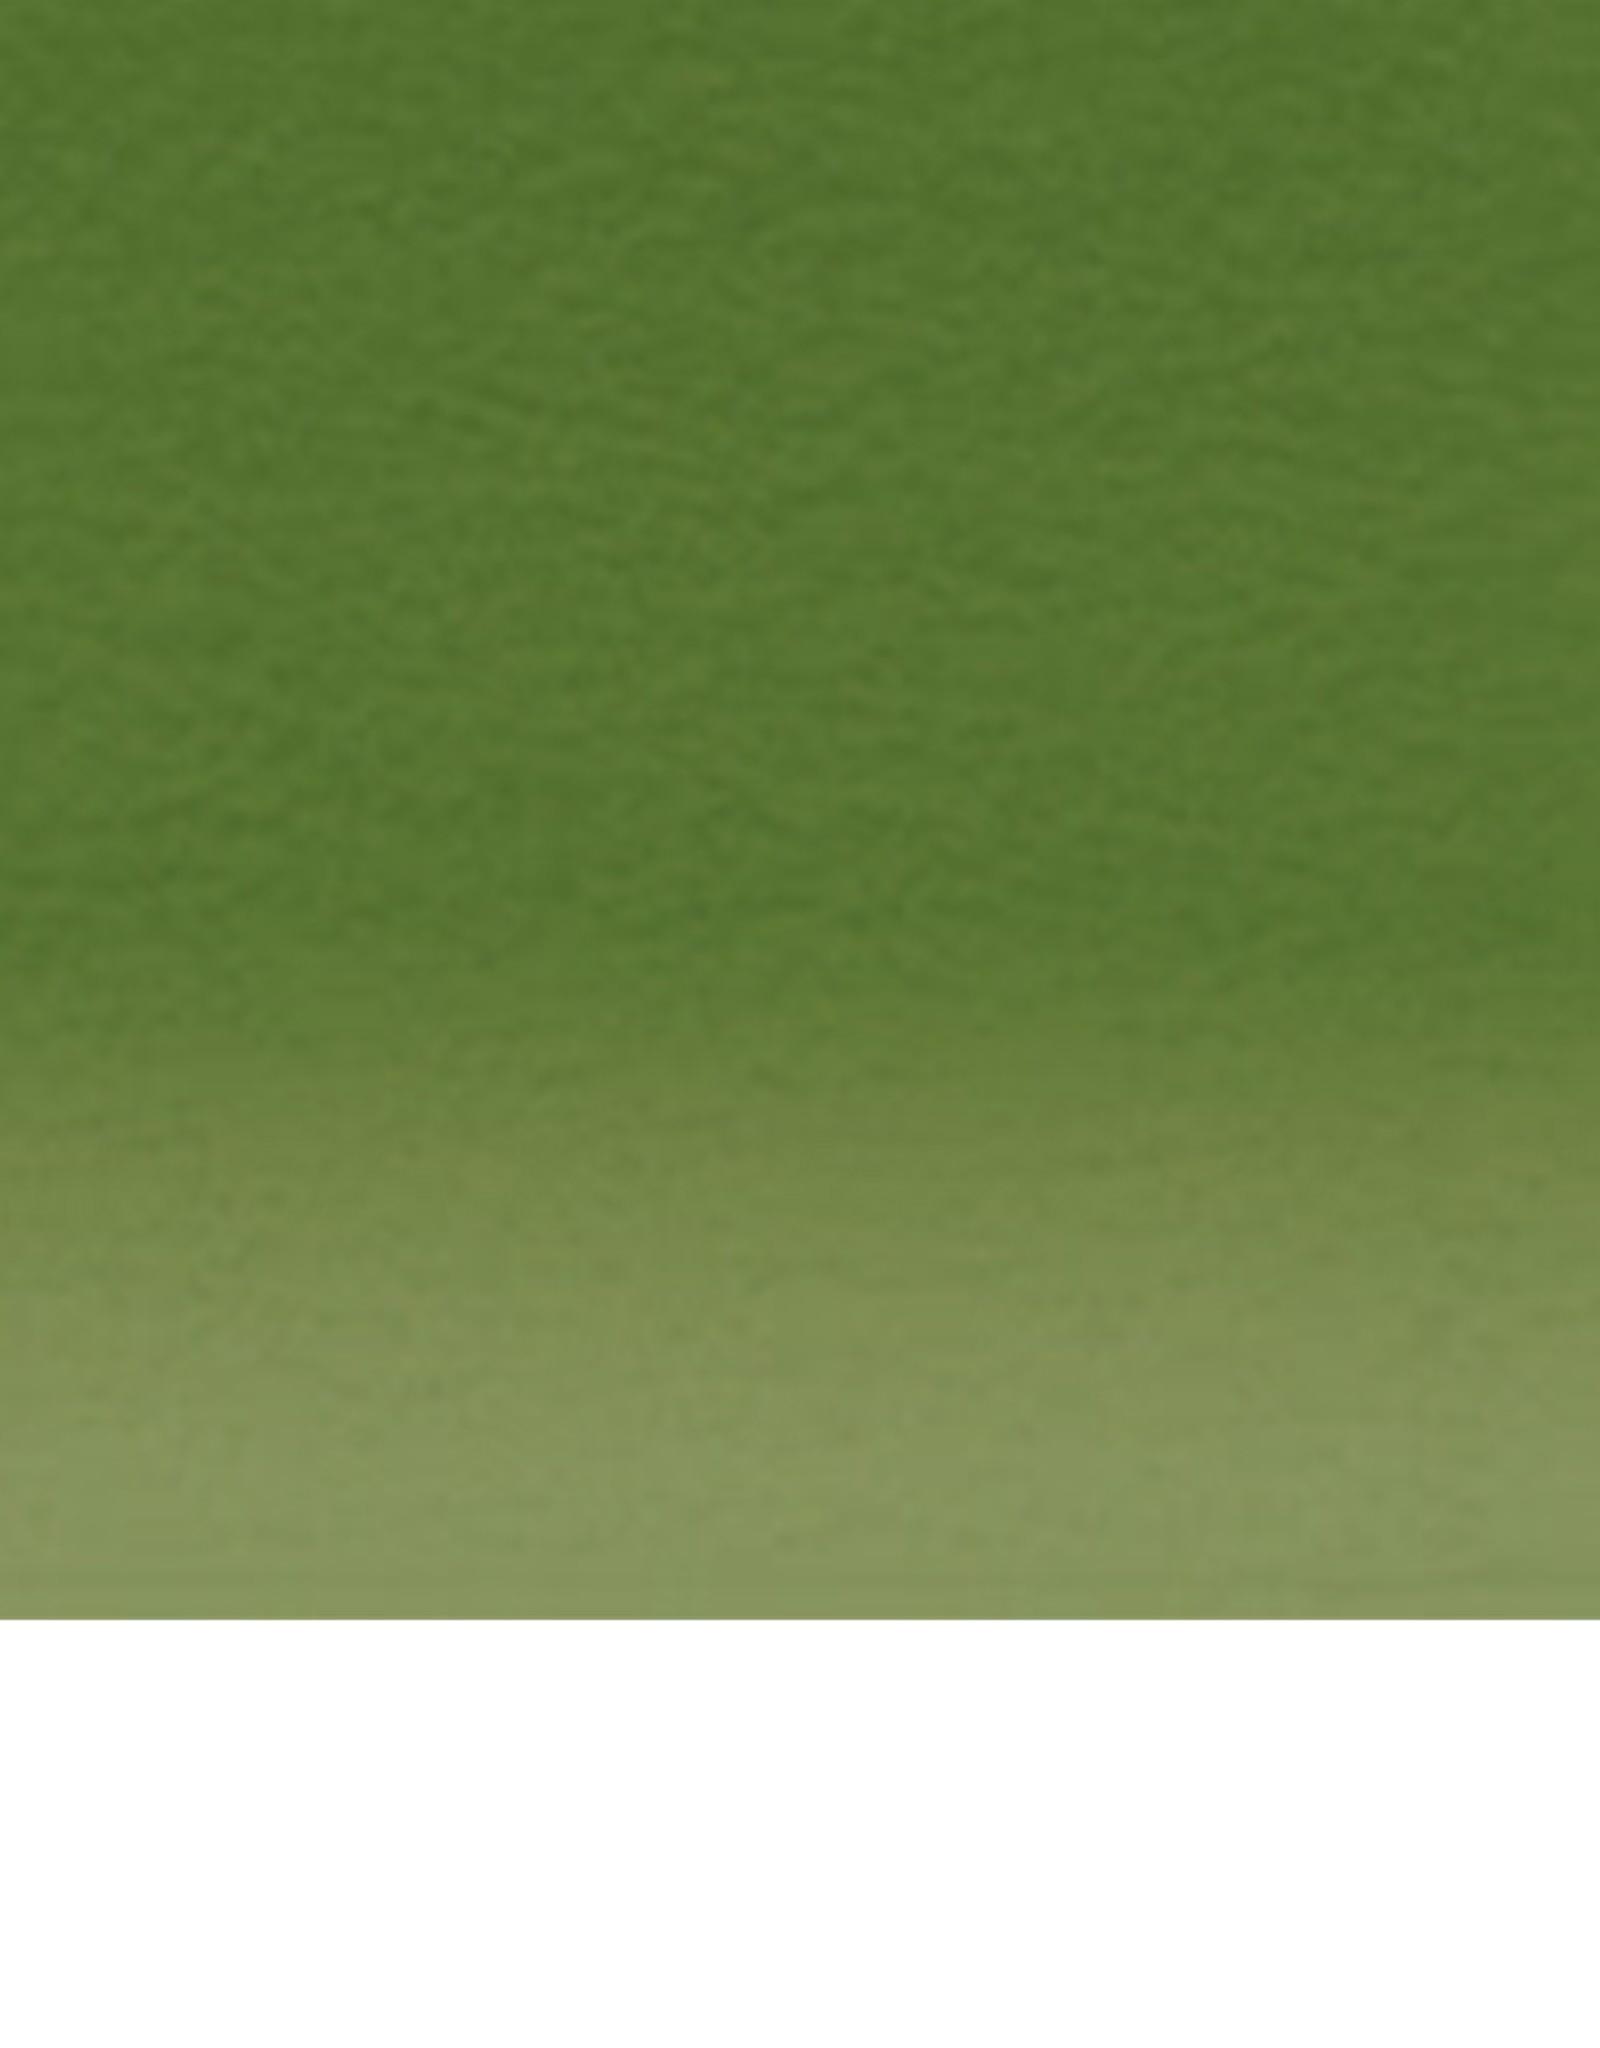 Inktense Potlood Beech Green